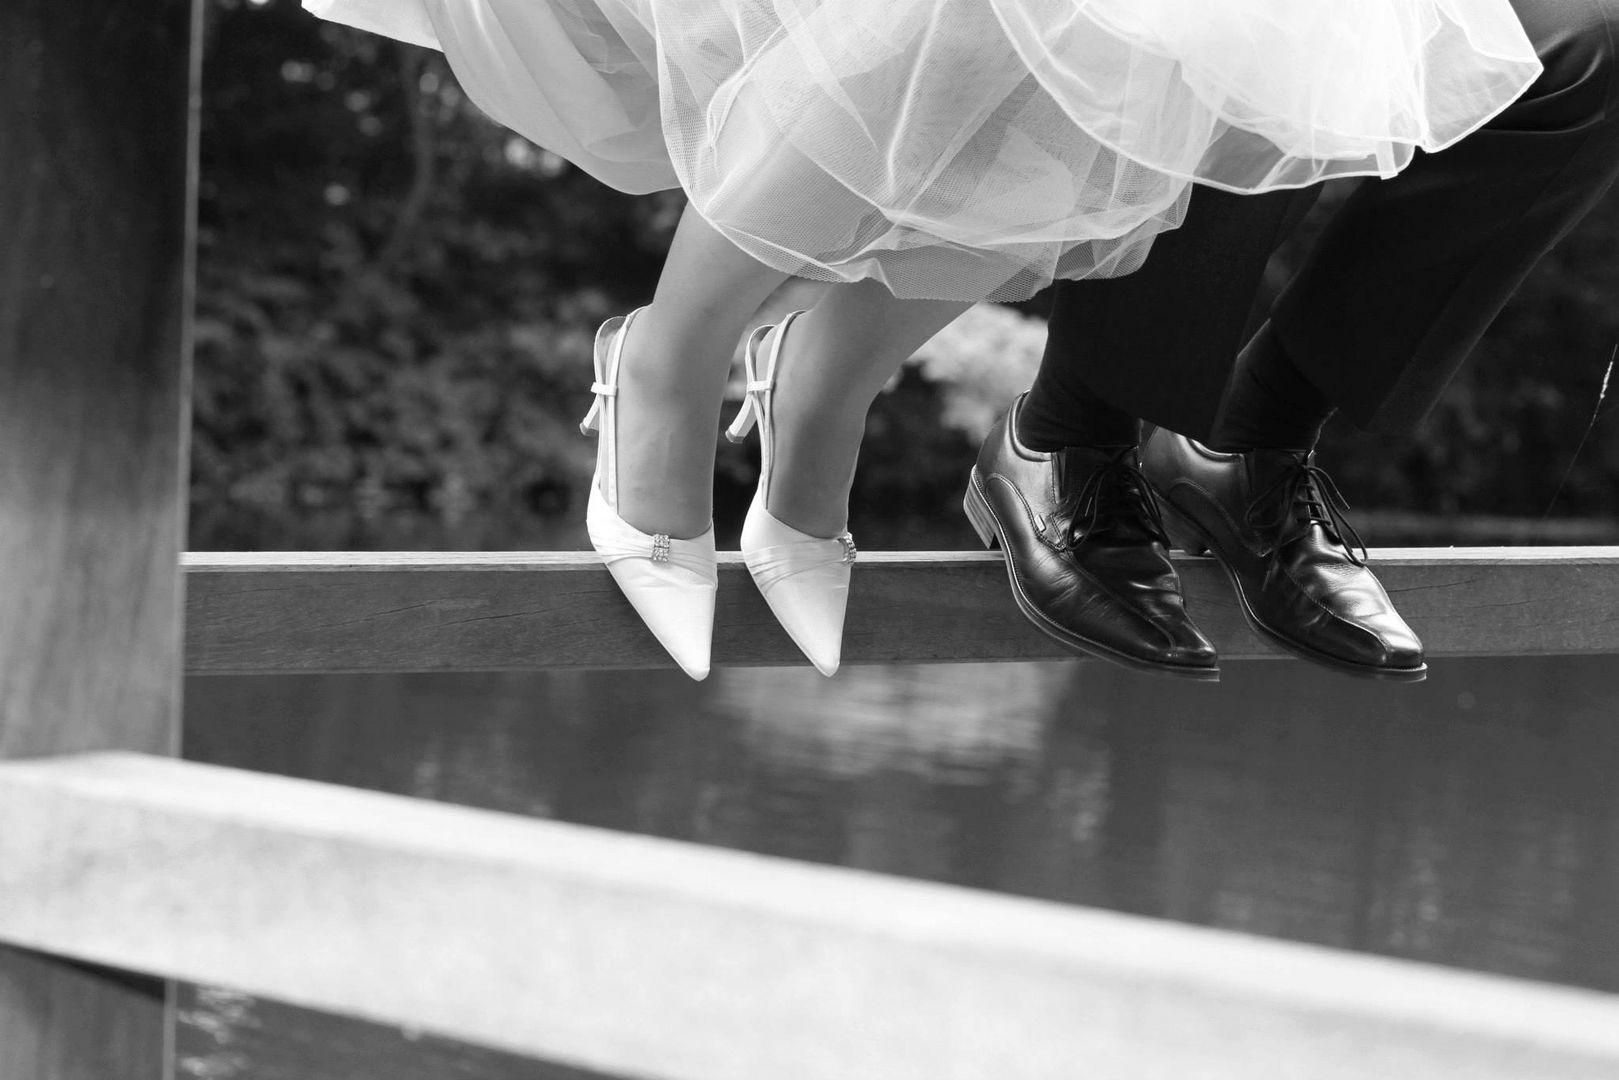 Pause beim Brautshooting